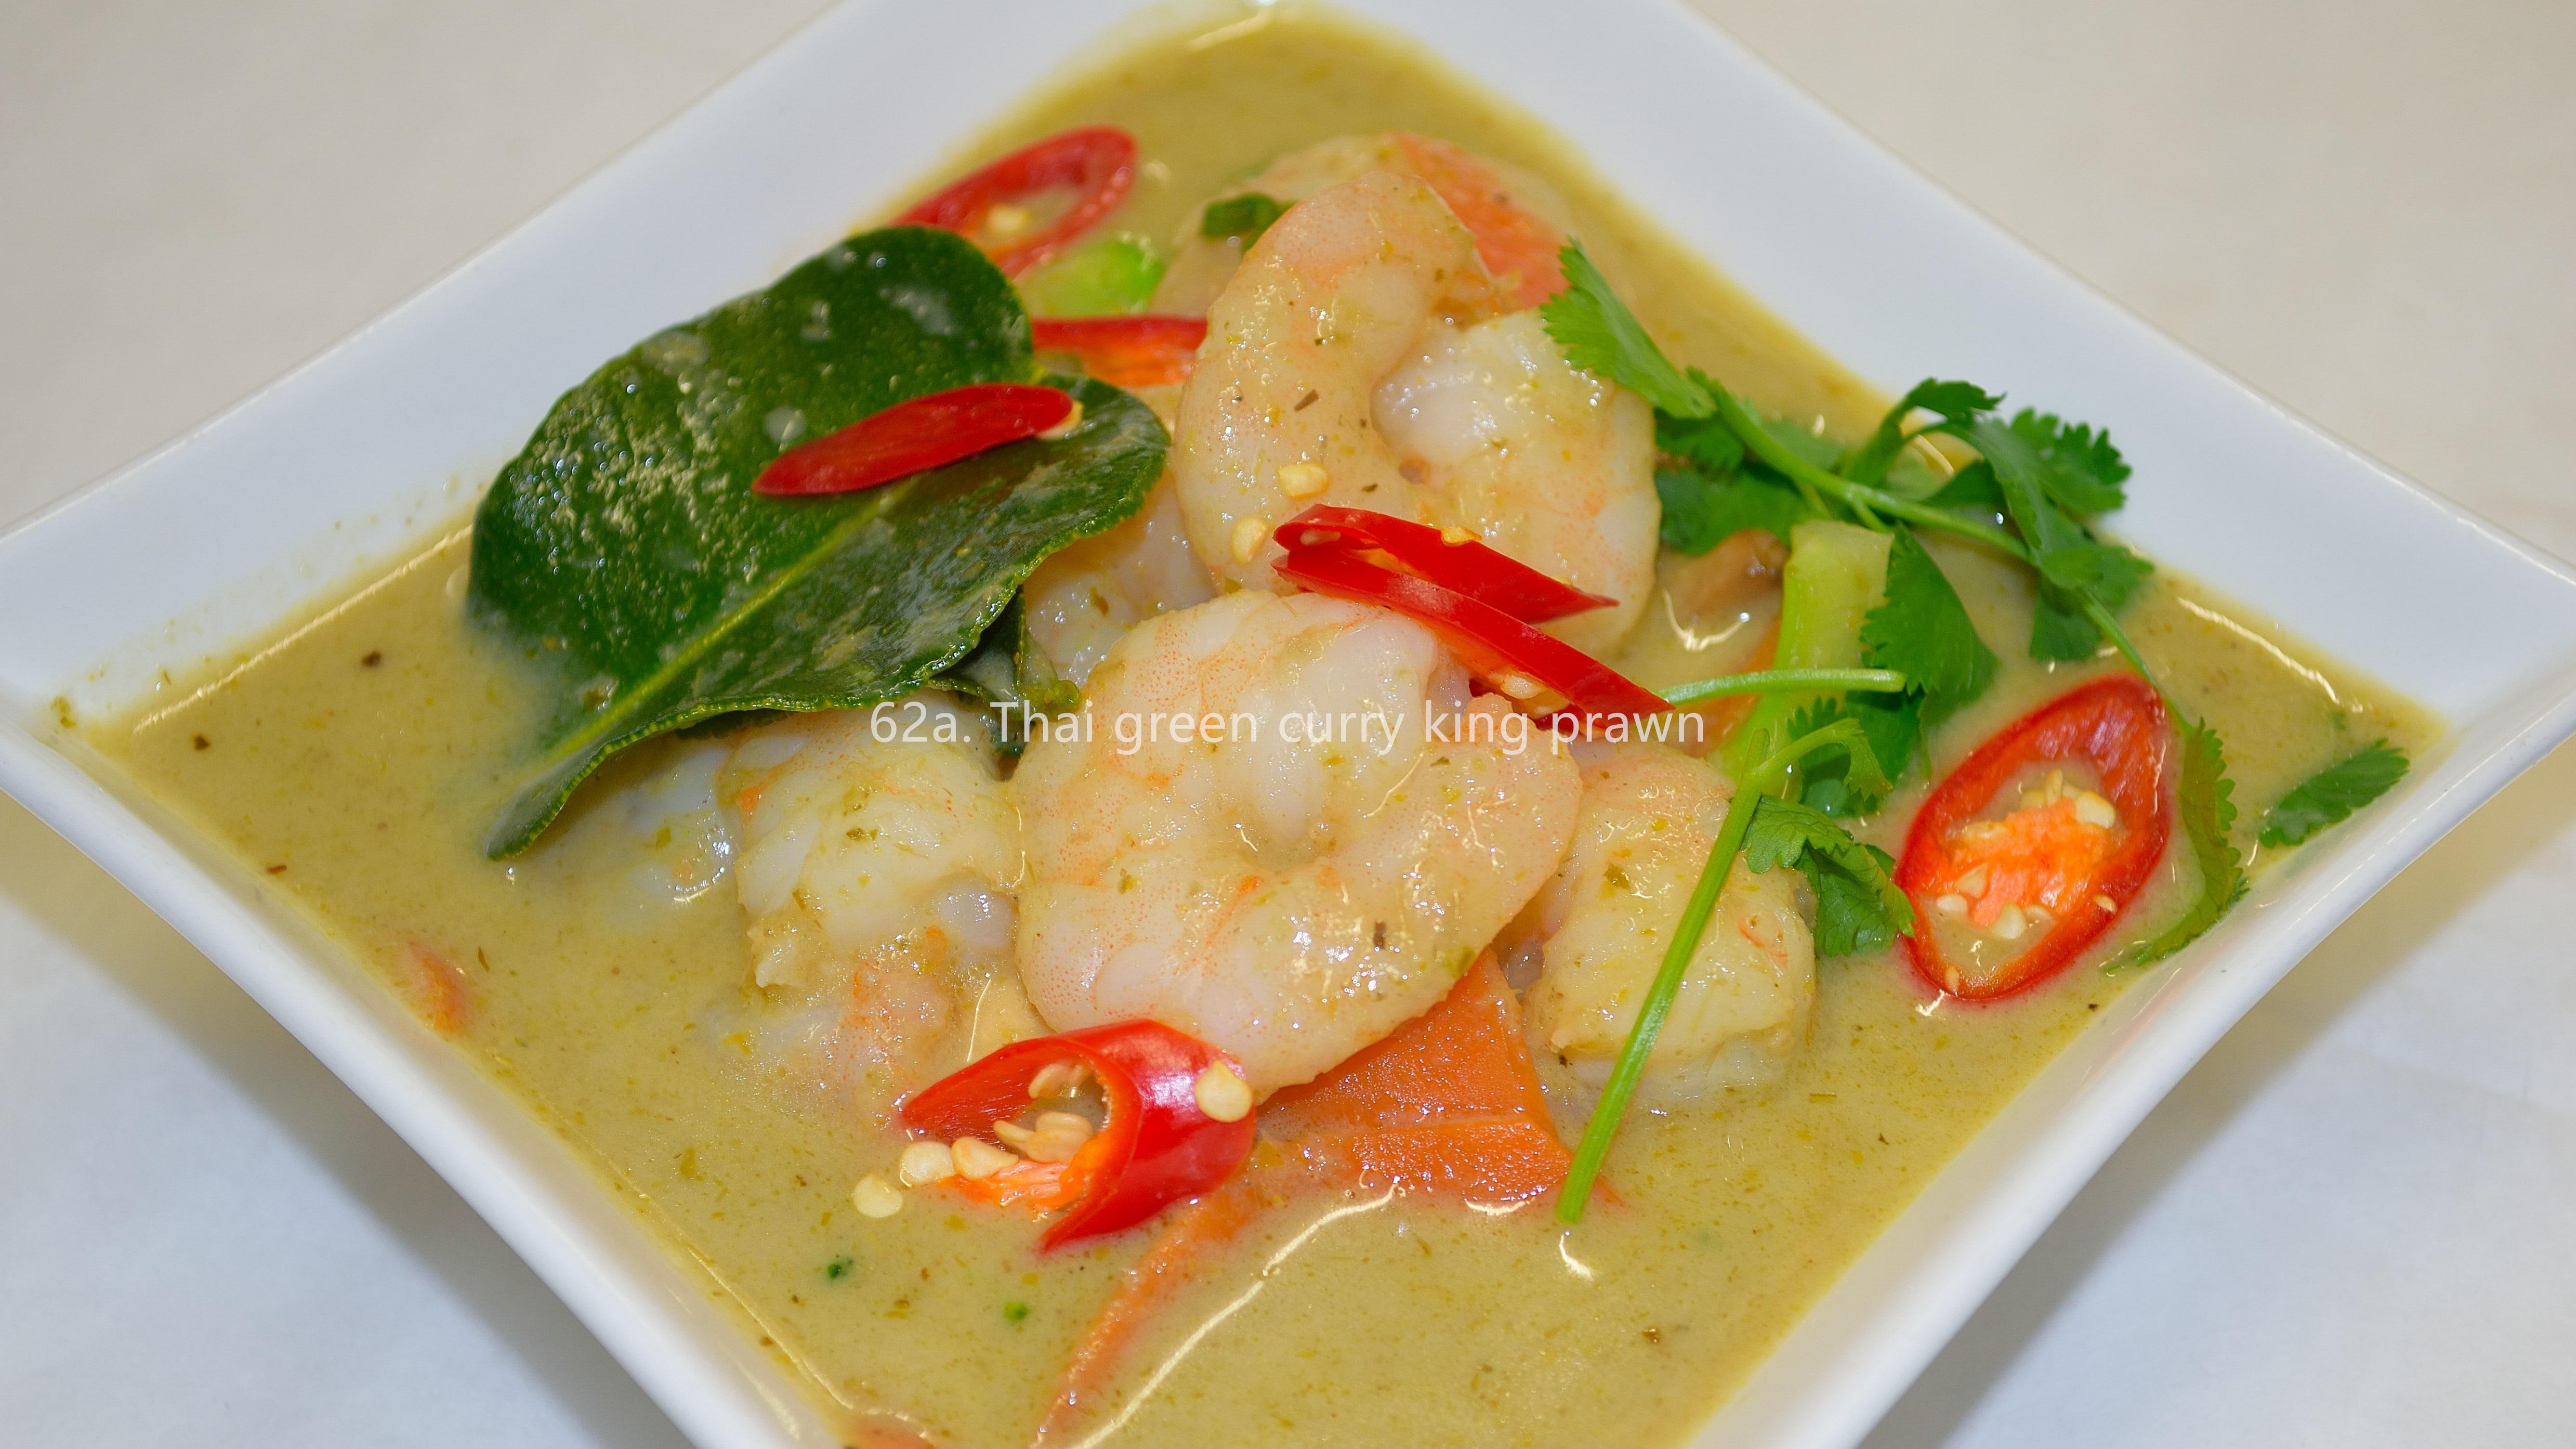 Thai red curry king prawn